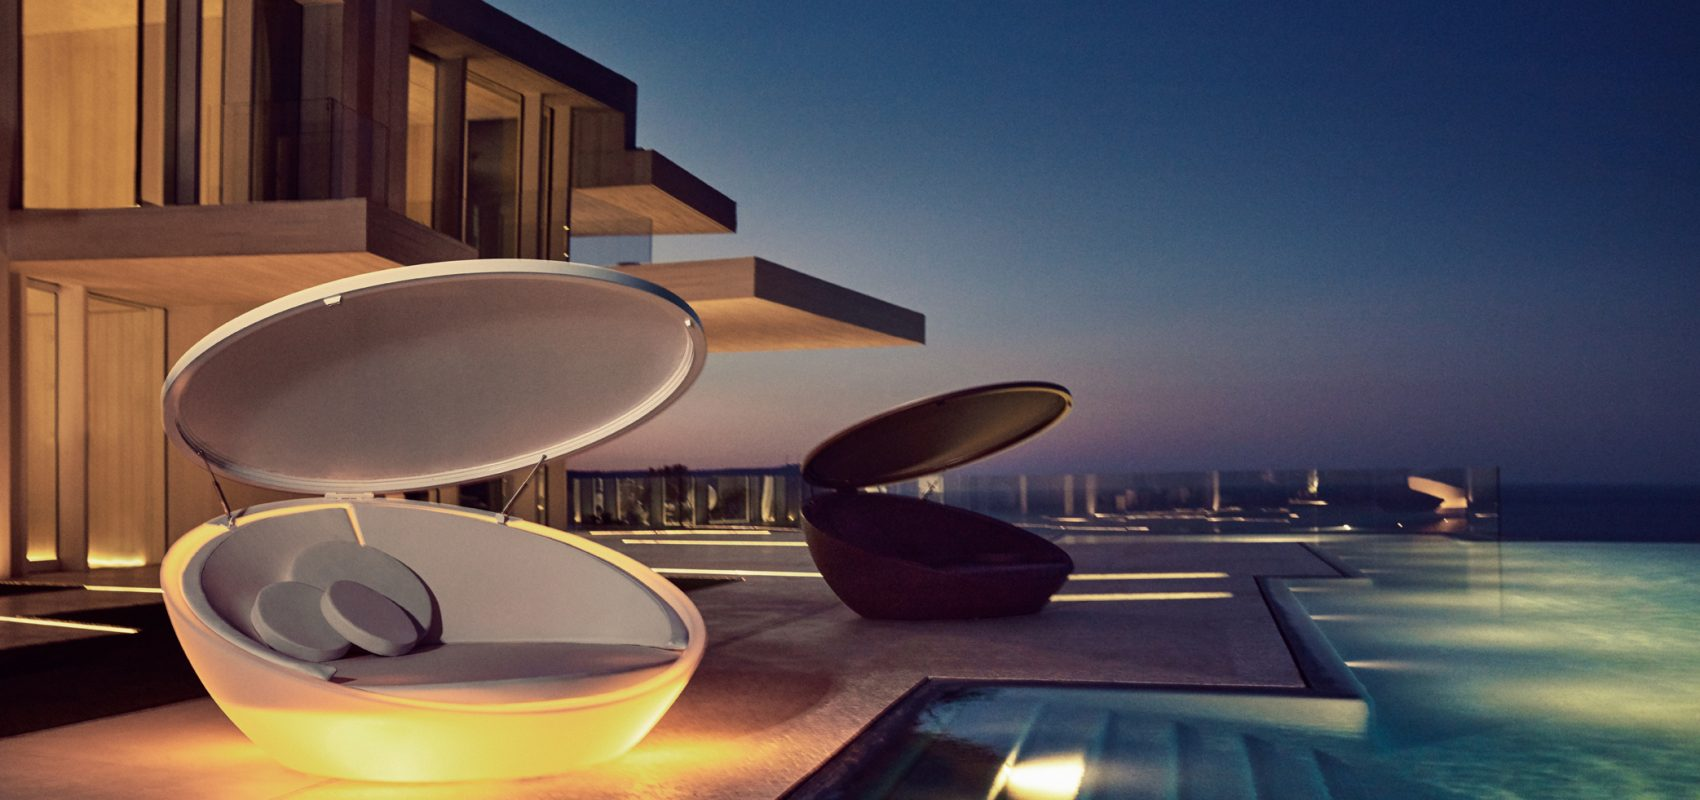 Wondrous Ard Outdoor Toronto Outdoor Furniture Patio Furniture Interior Design Ideas Philsoteloinfo